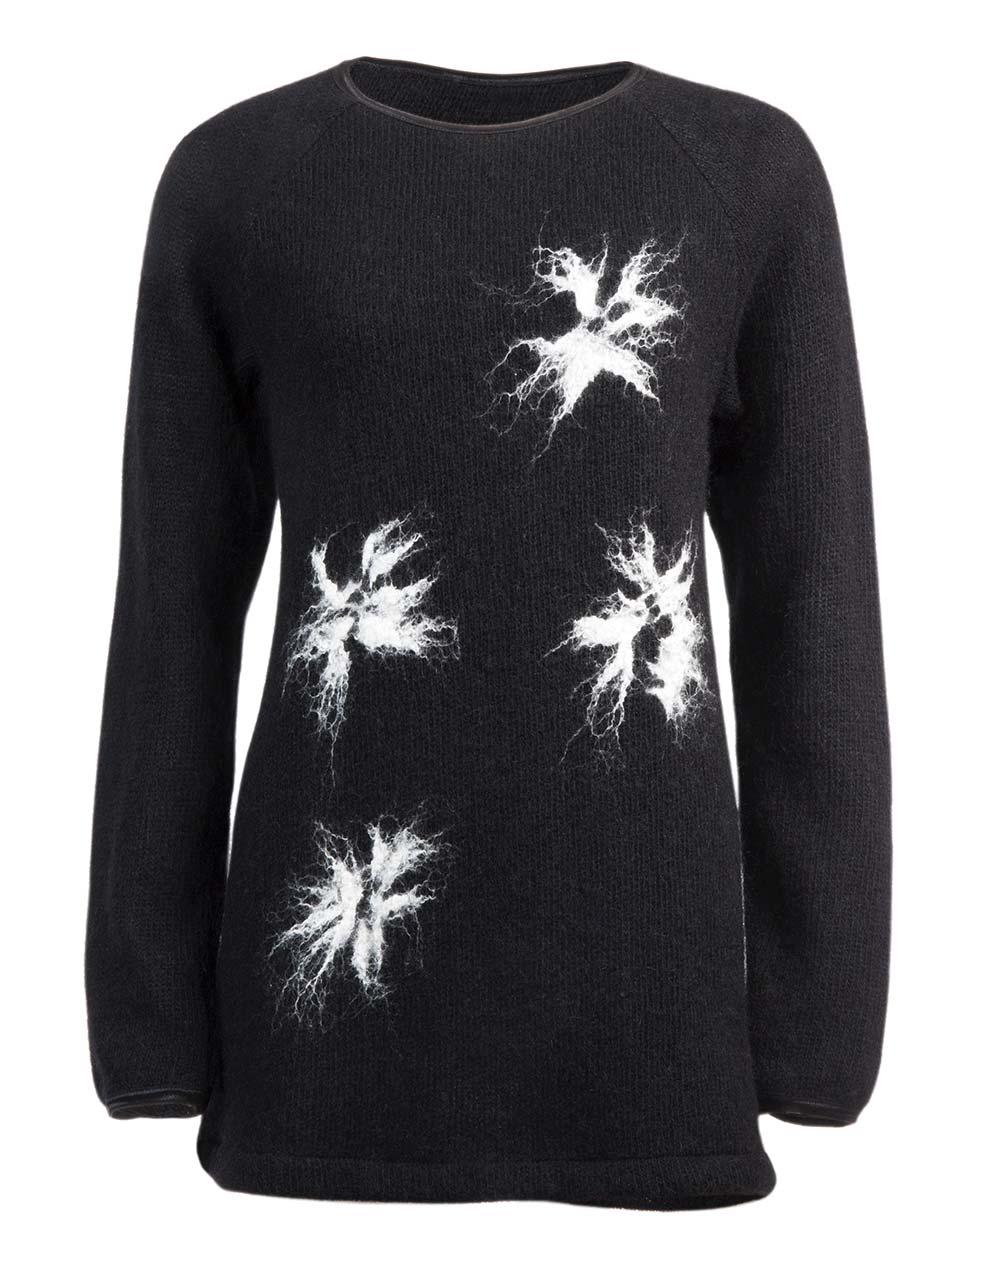 show a-shape sweater, gjoska design